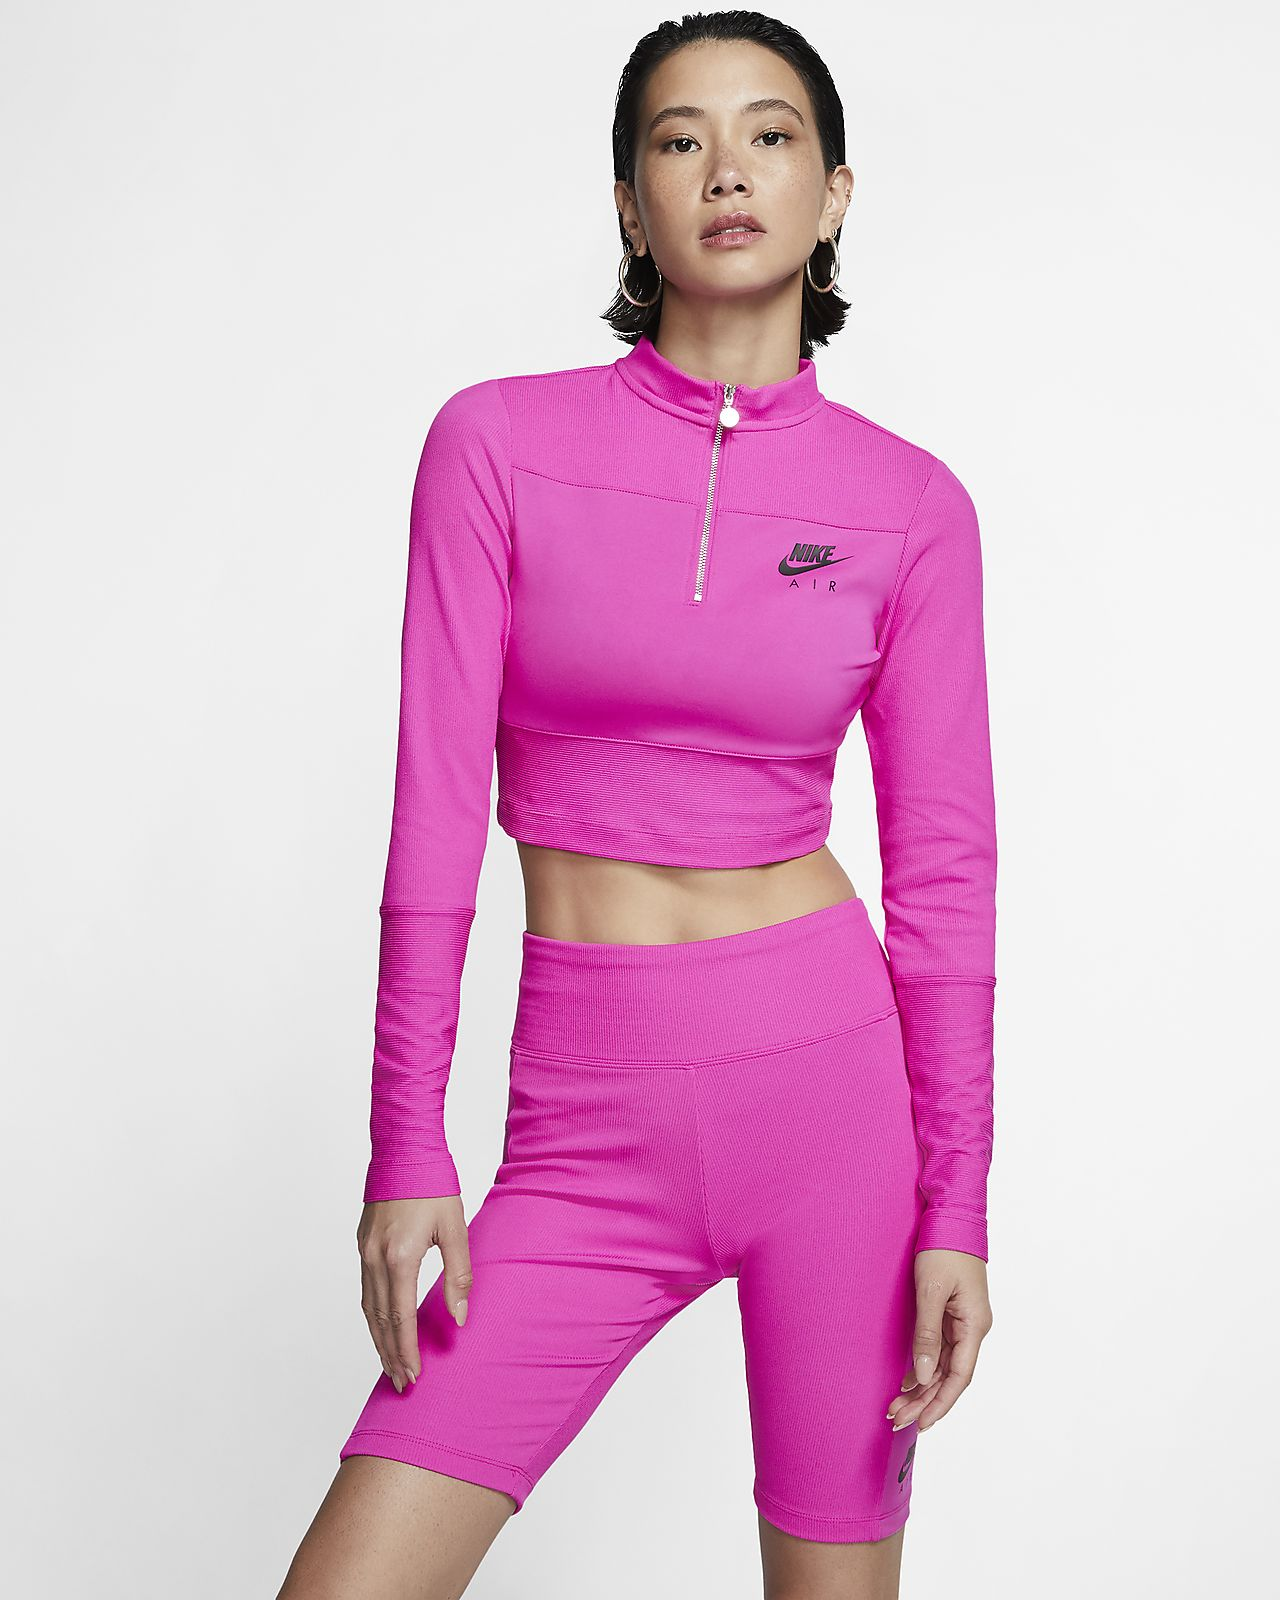 Prenda para la parte superior de manga larga en tela rib para mujer Nike Air